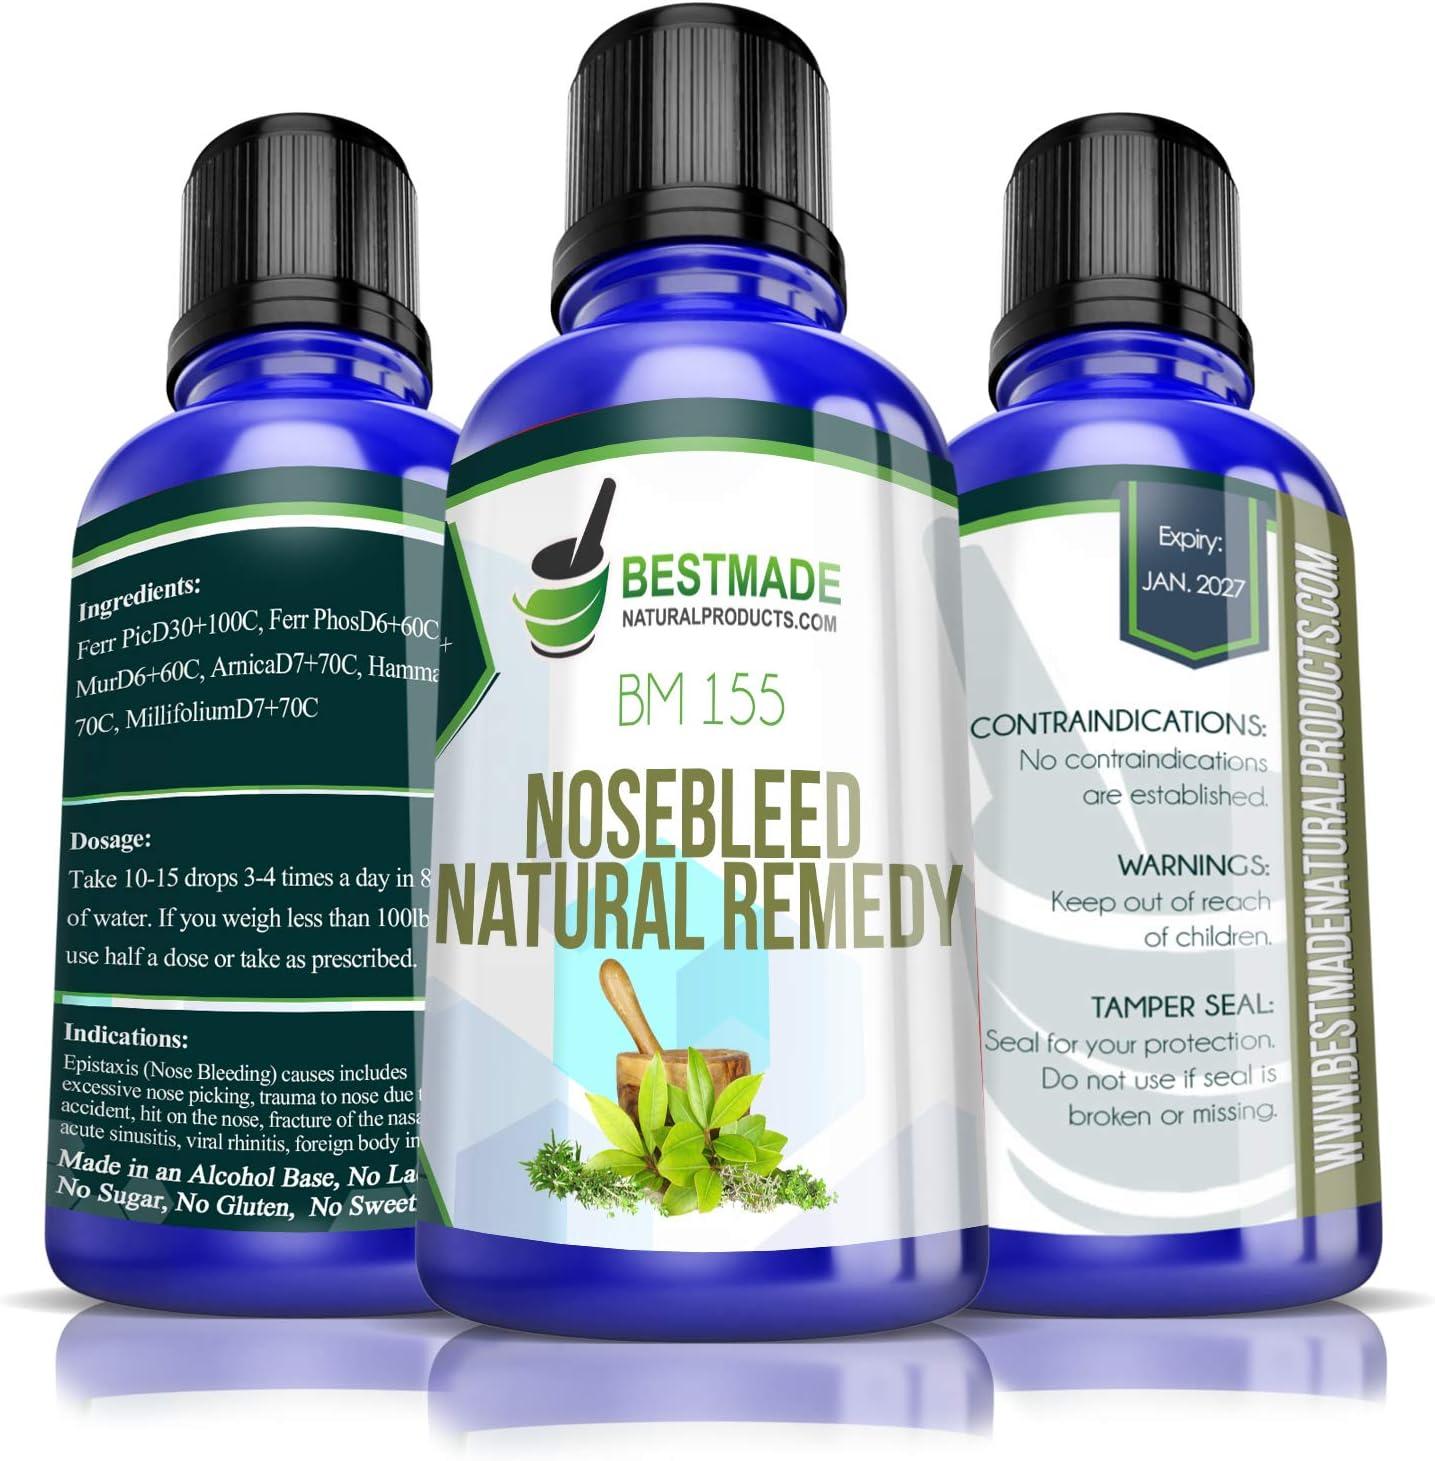 Nosebleed Natural Remedy 有名な 誕生日プレゼント BM155